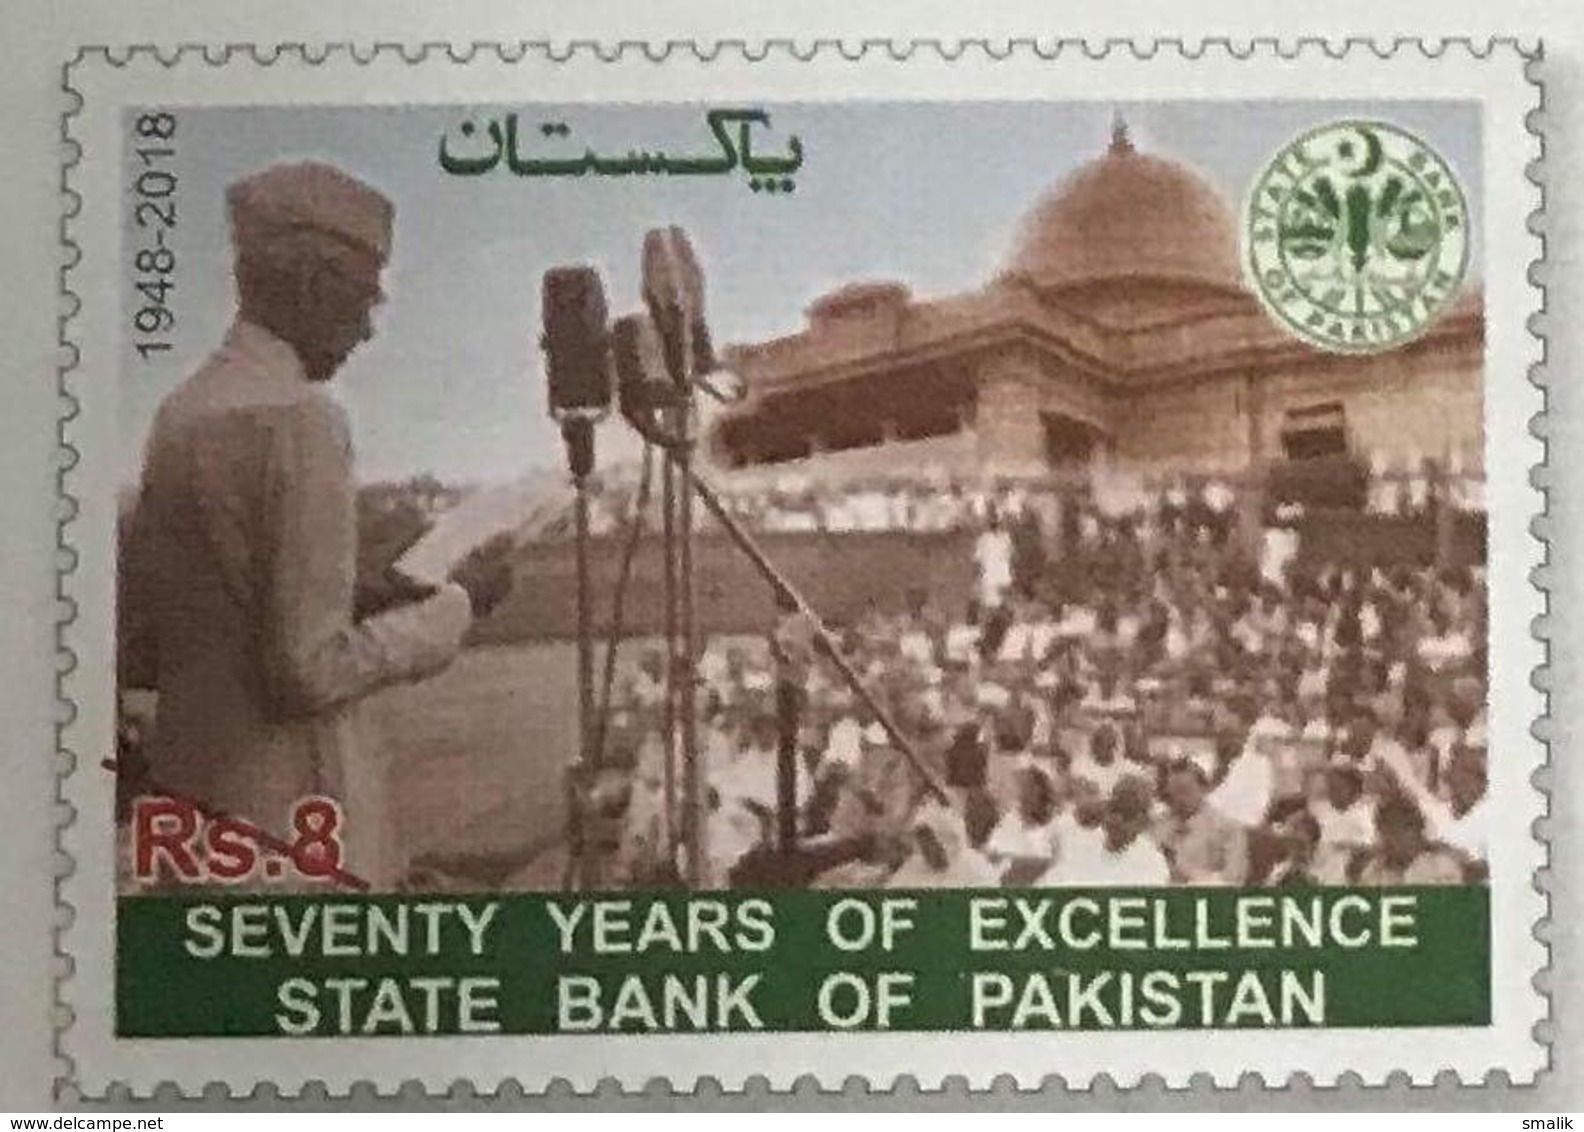 PAKISTAN 2018 - 70 Years Of Excellence, State Bank Of Pakistan, Quaid-e-Azam Jinnah Adressing, 1v MNH - Pakistan